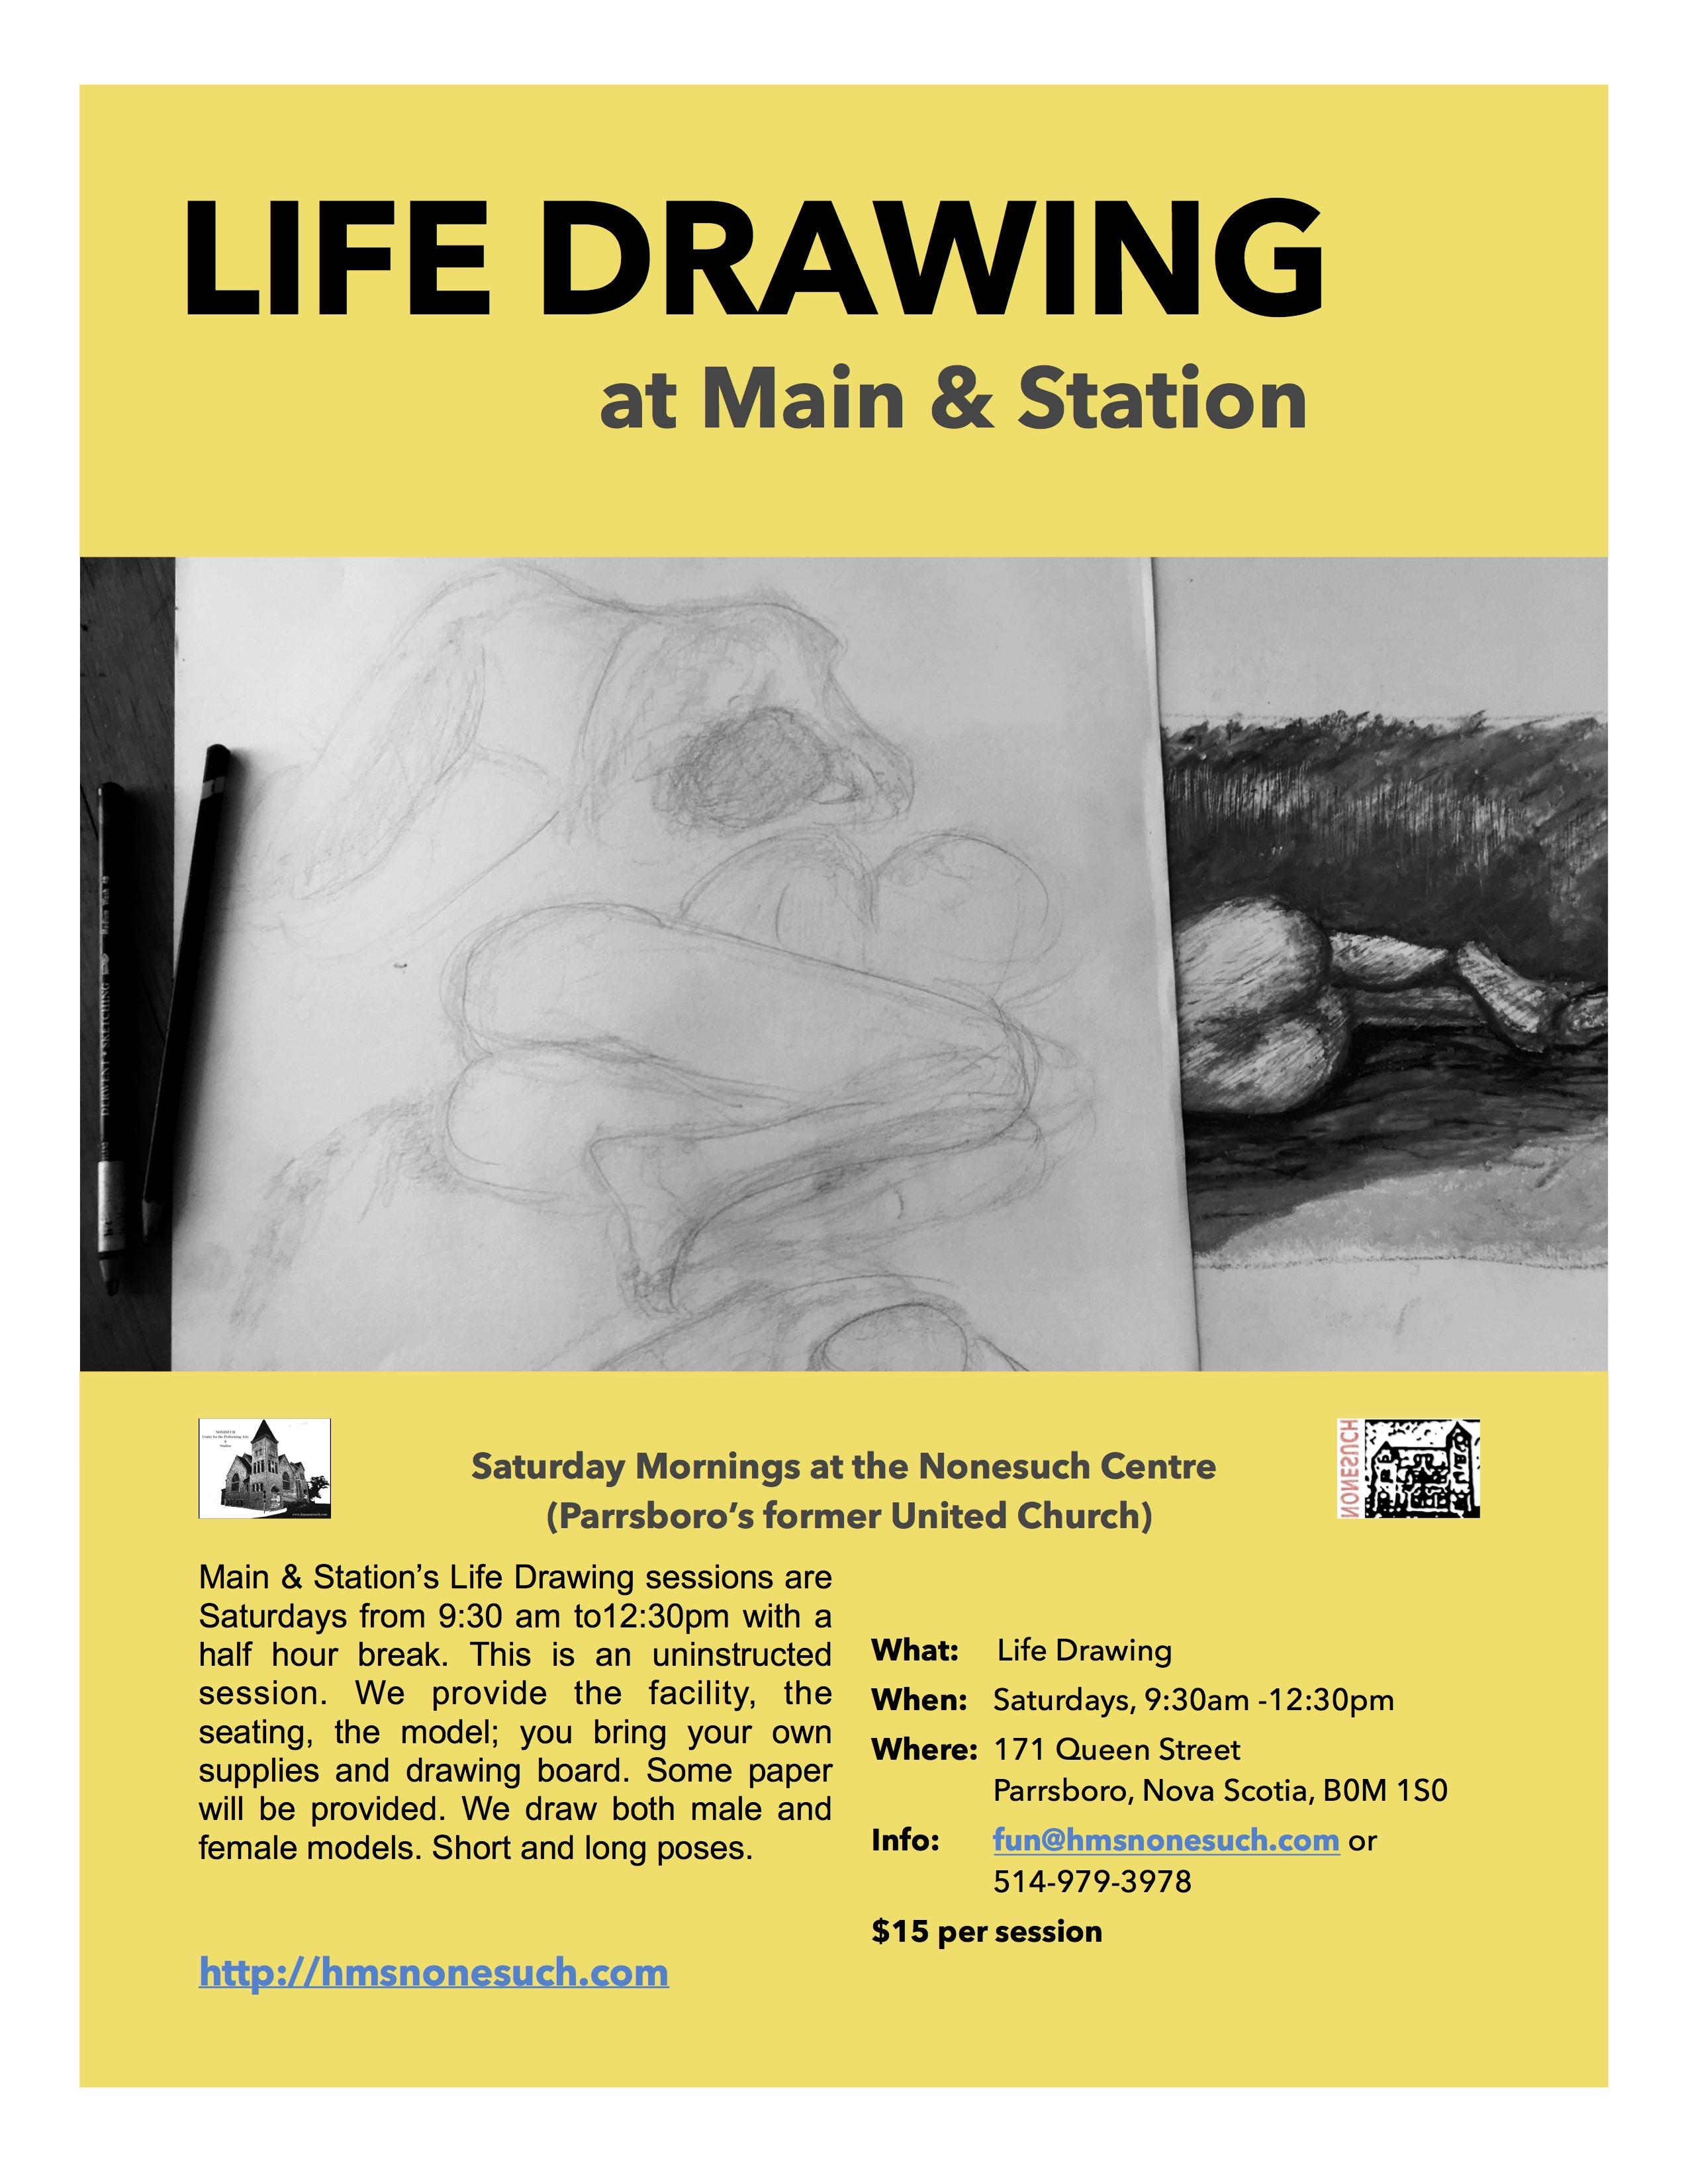 life drawing parrsboro_171 Queen Street